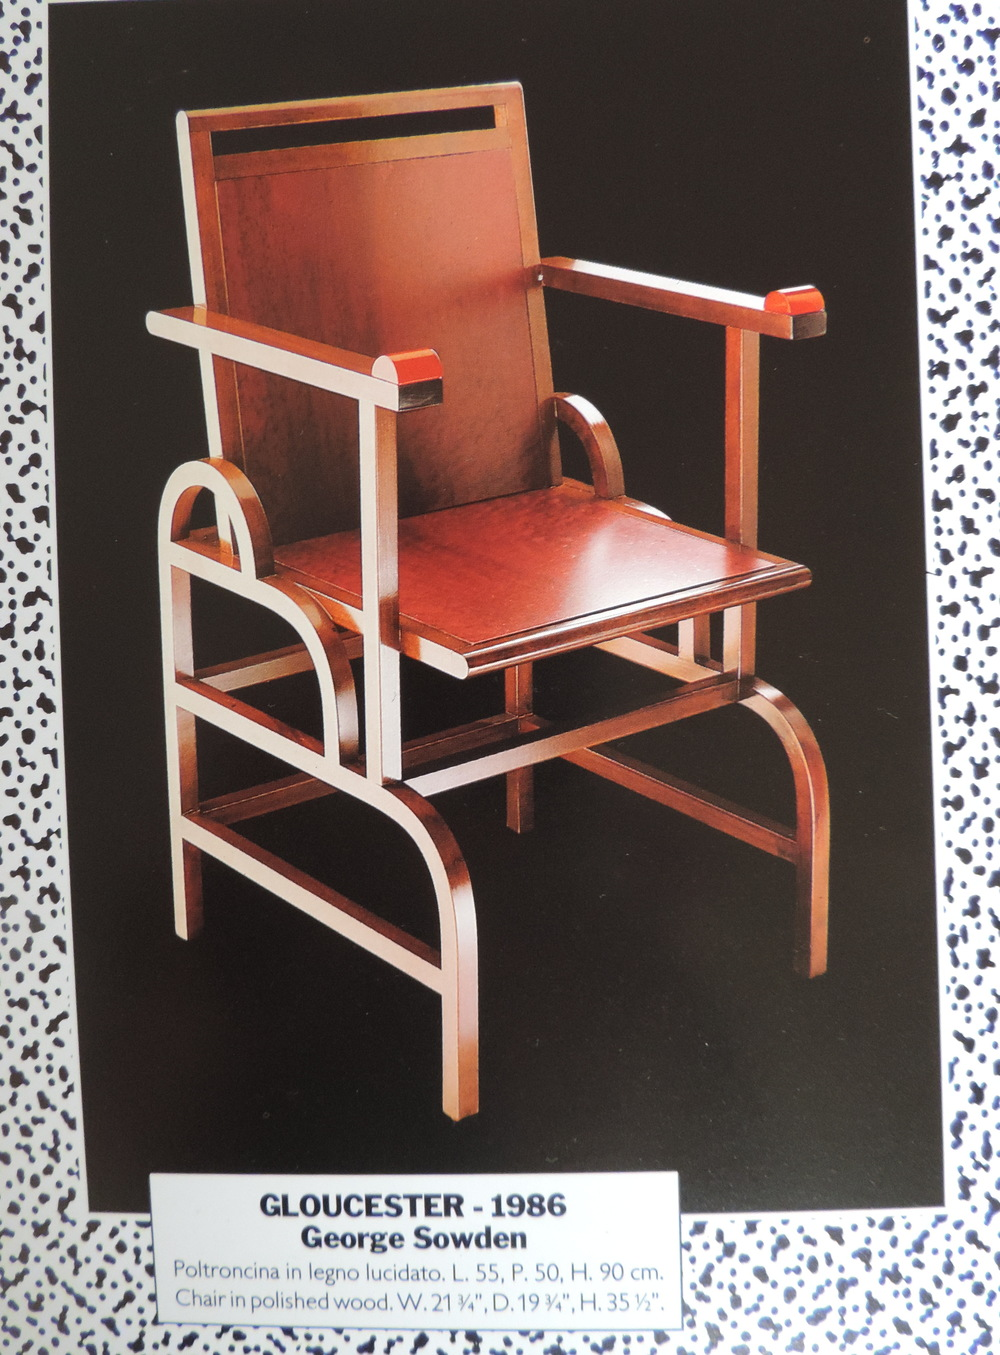 Gloucester Chair for Memphis Milano 1986. Image: (c) Memphis Milano 1981